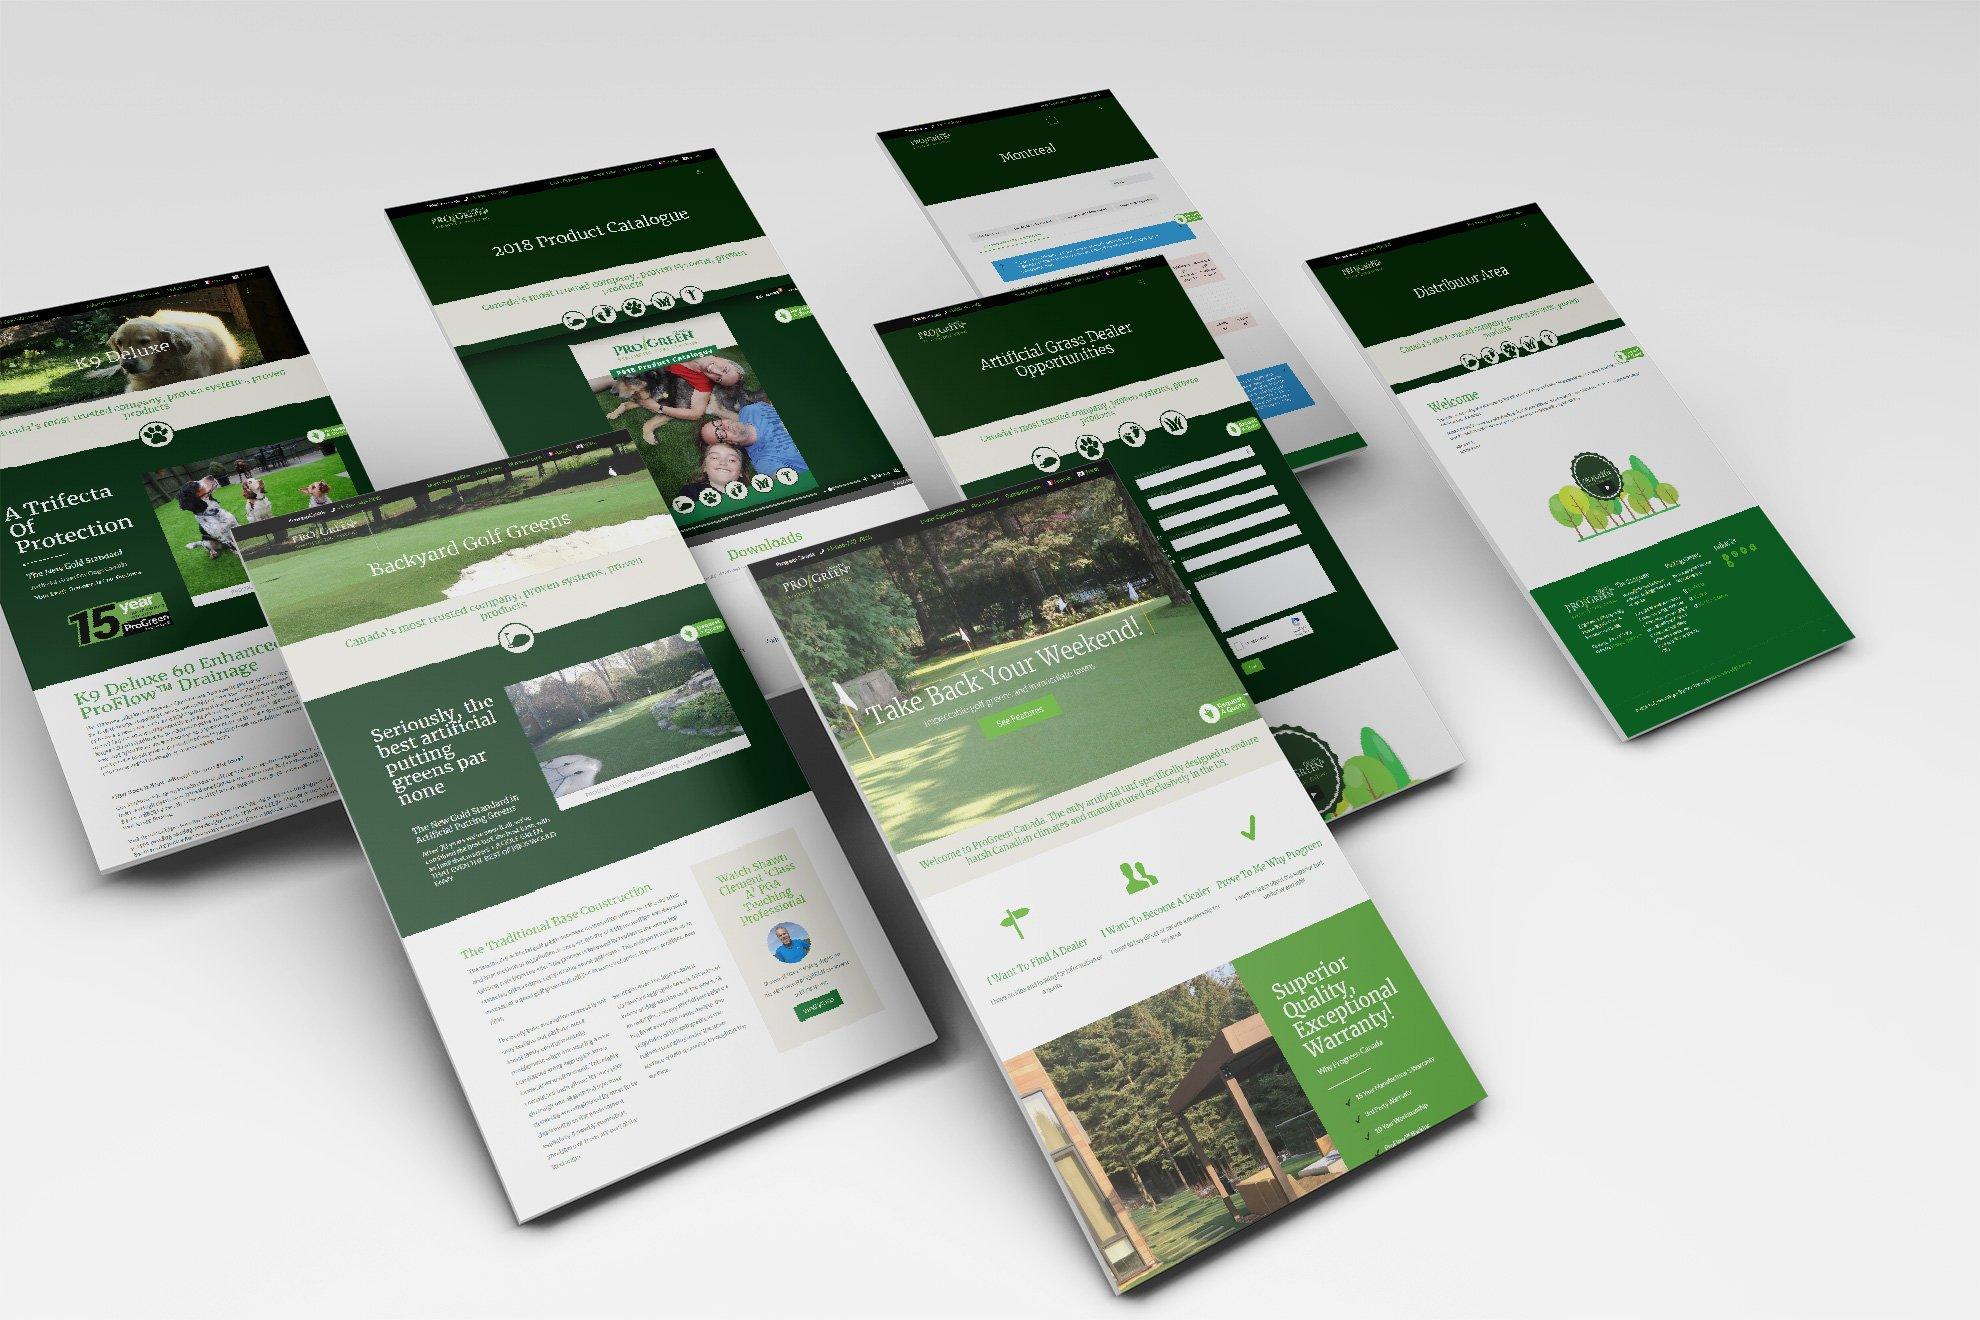 pro-greens-perspective-website-mockup